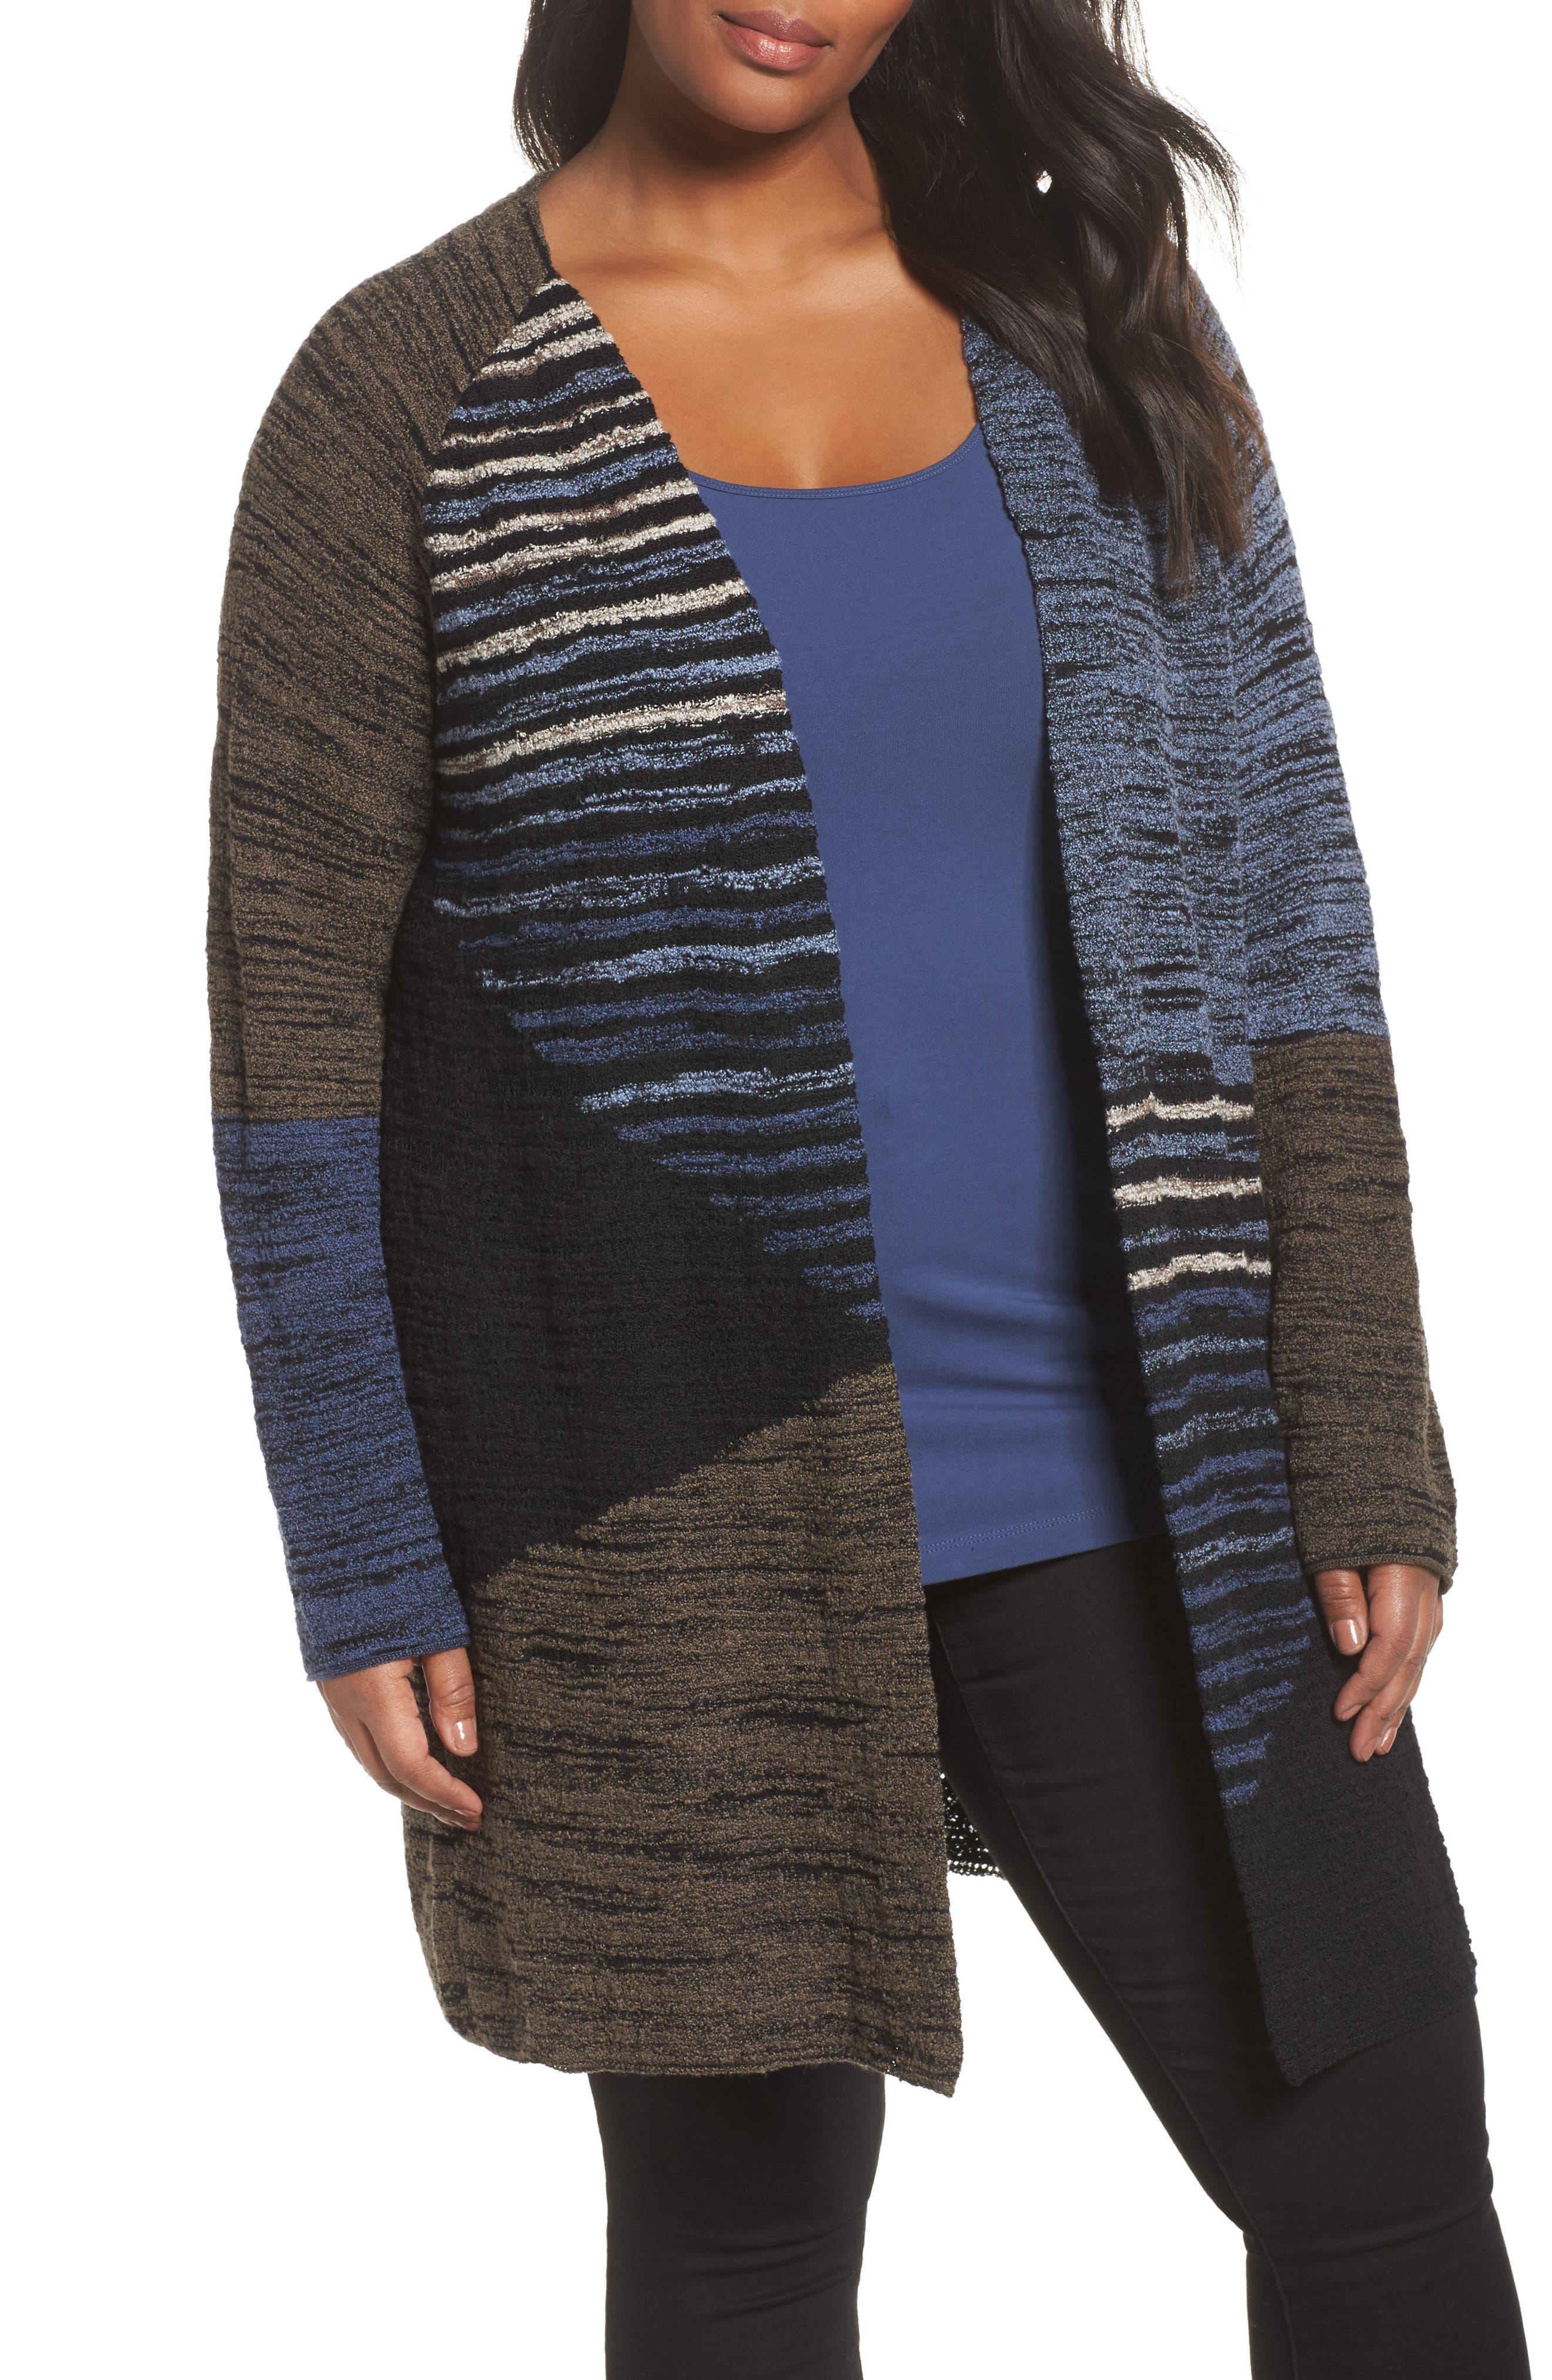 Alternate Image 1 Selected - NIC+ZOE Layover Cardigan (Plus Size)